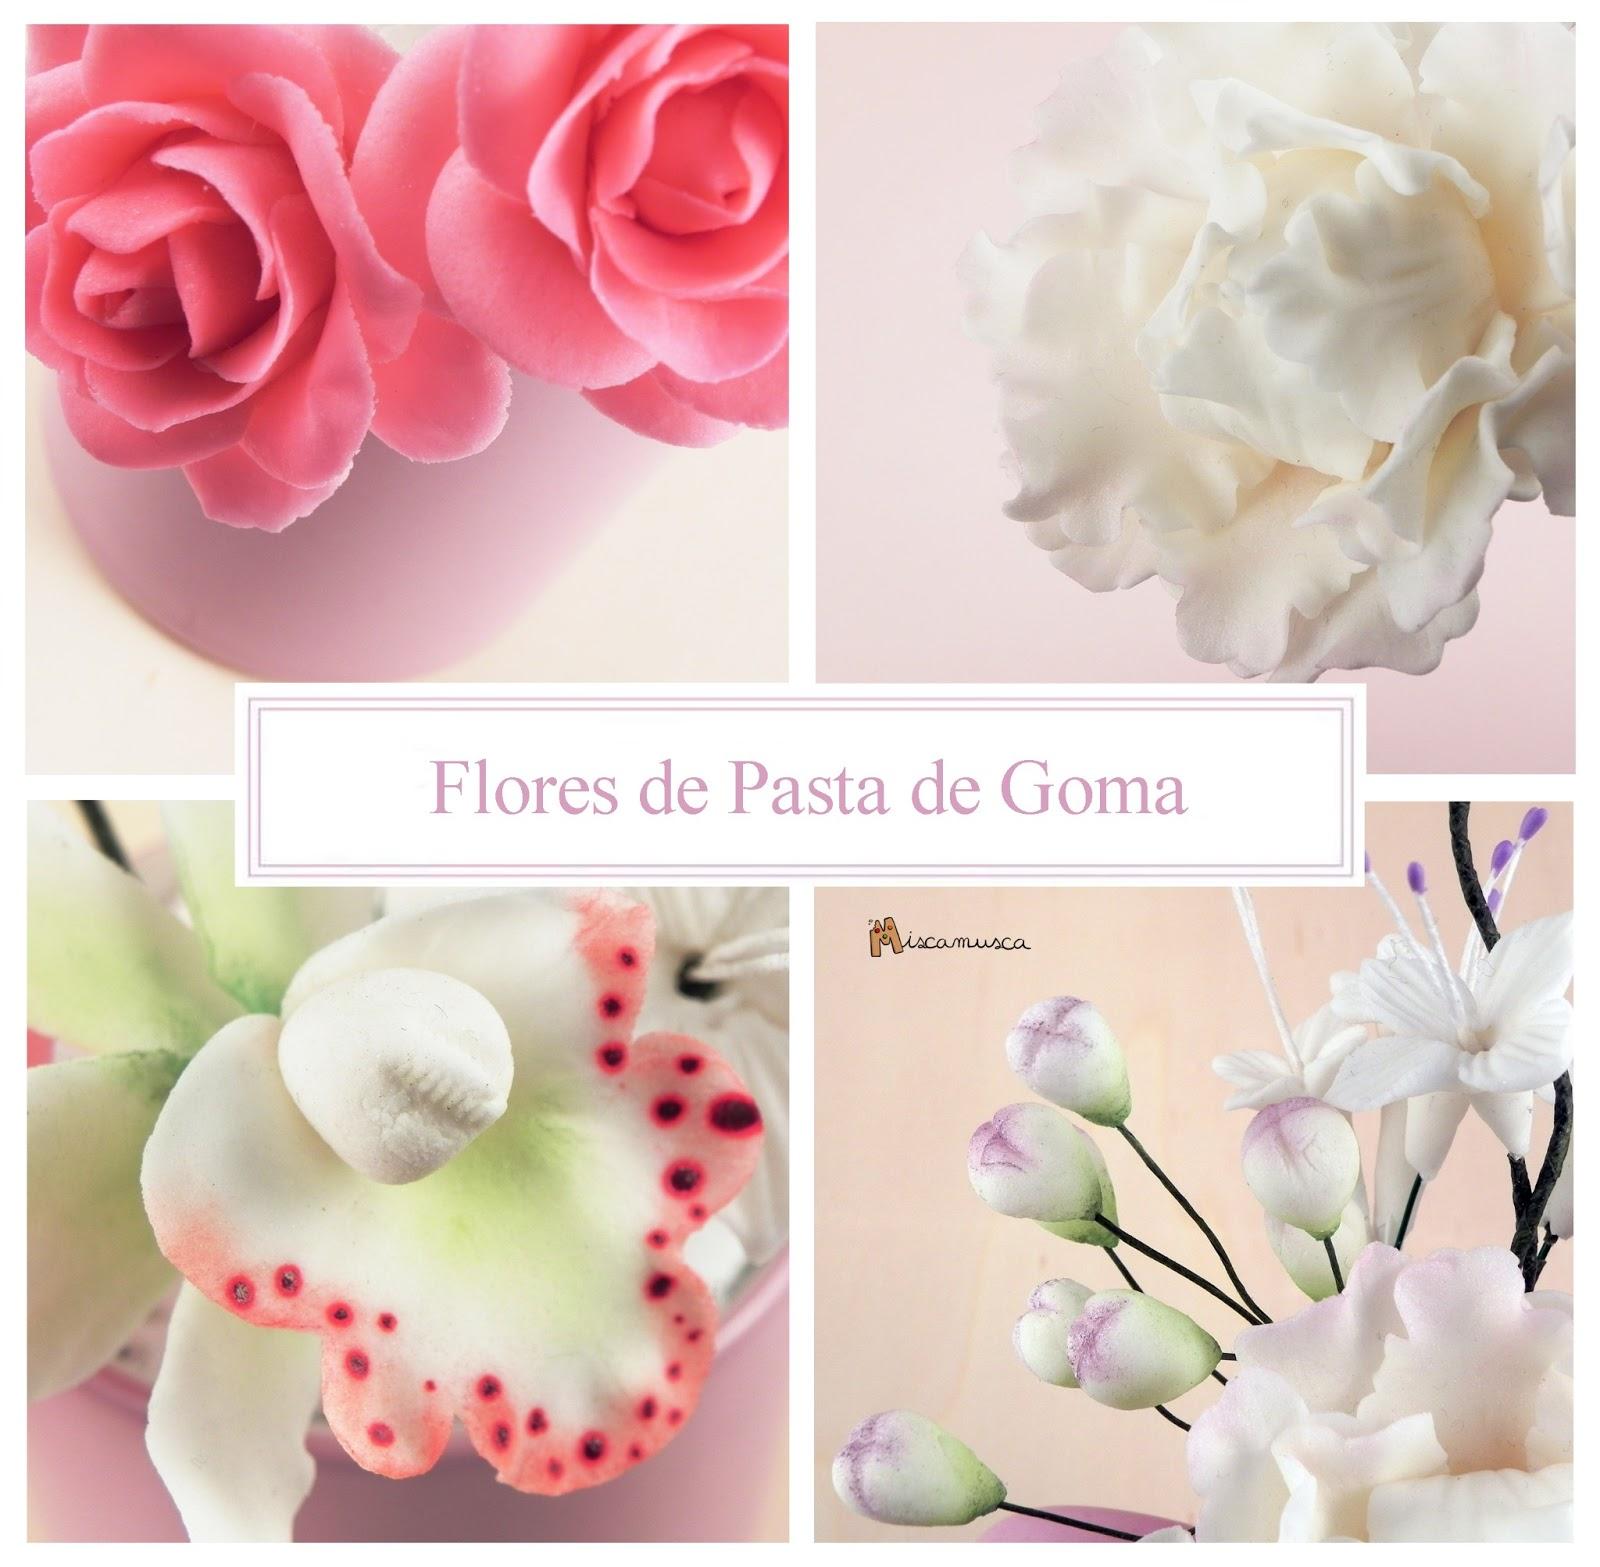 Flores de pasta de goma